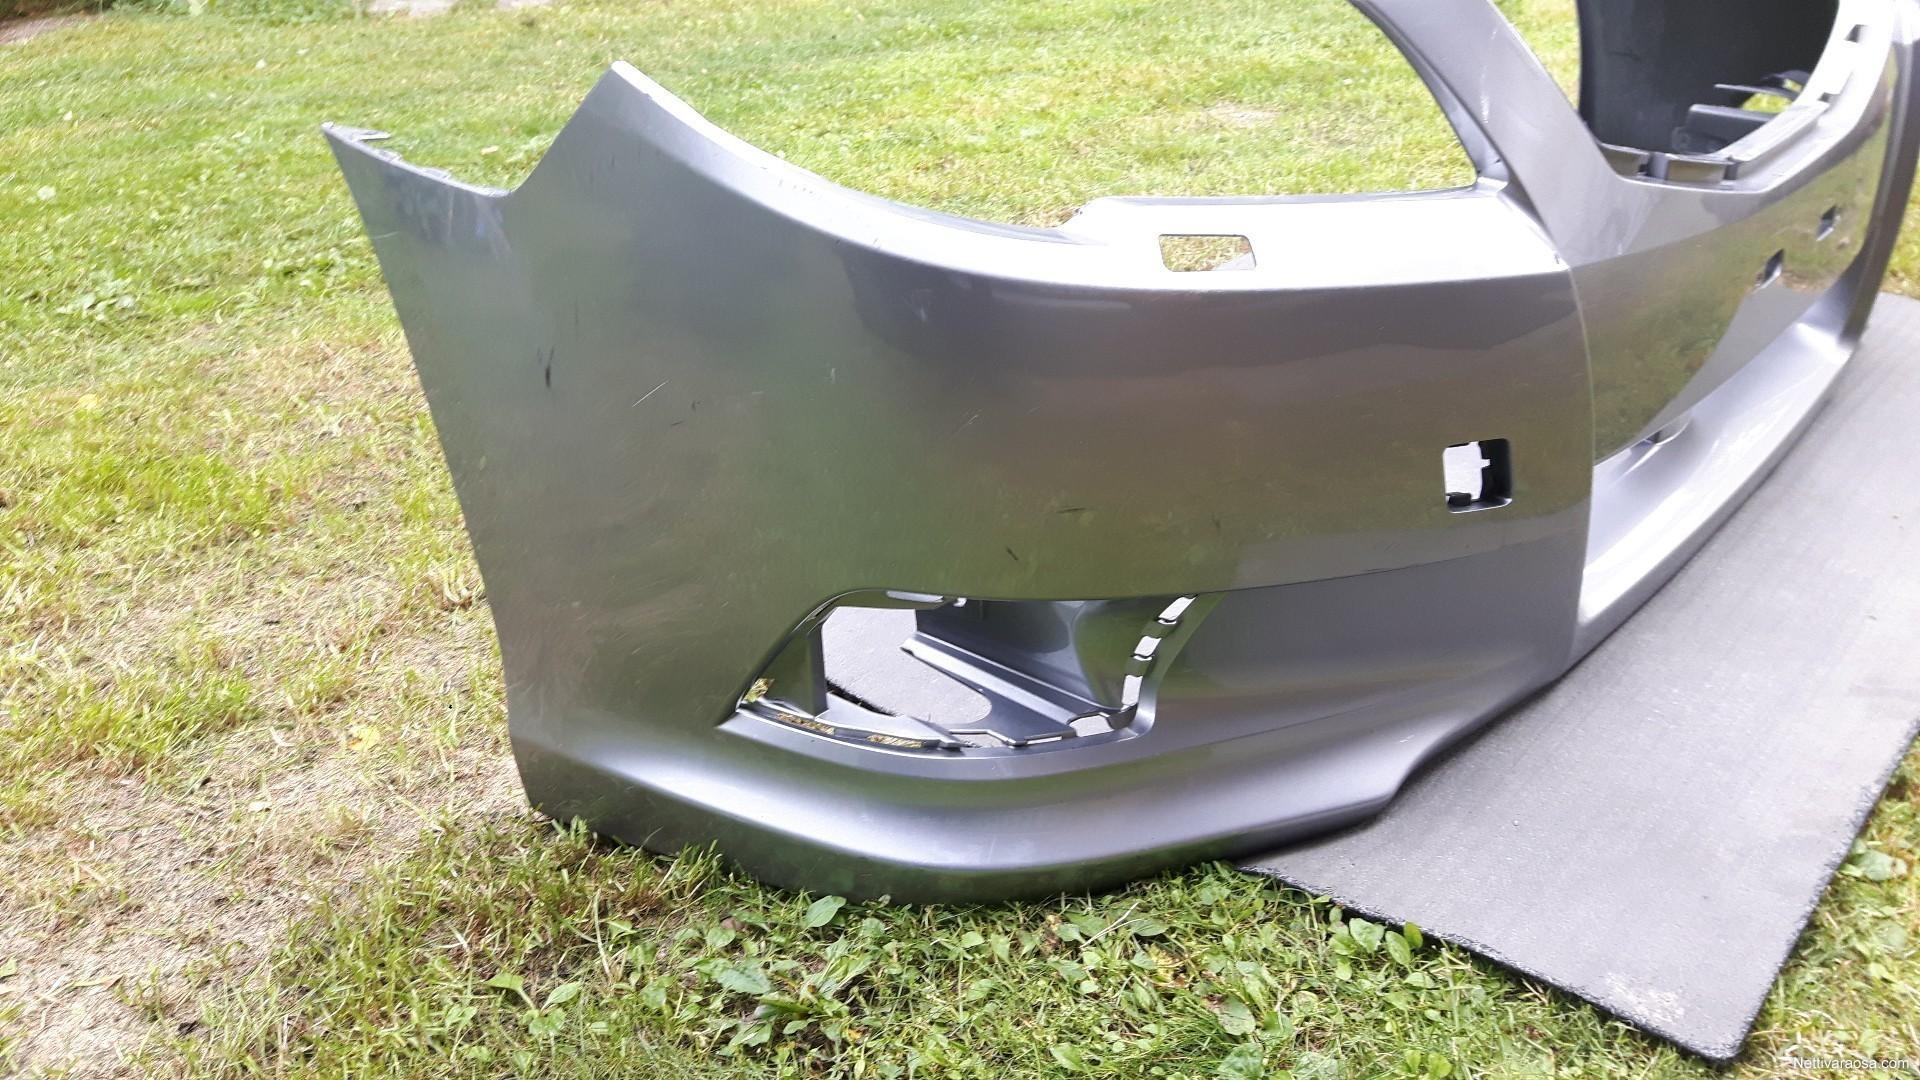 Subaru Legacy 2012 - Ehjä Legacy puskurin pinta - Car spare parts -  Nettivaraosa